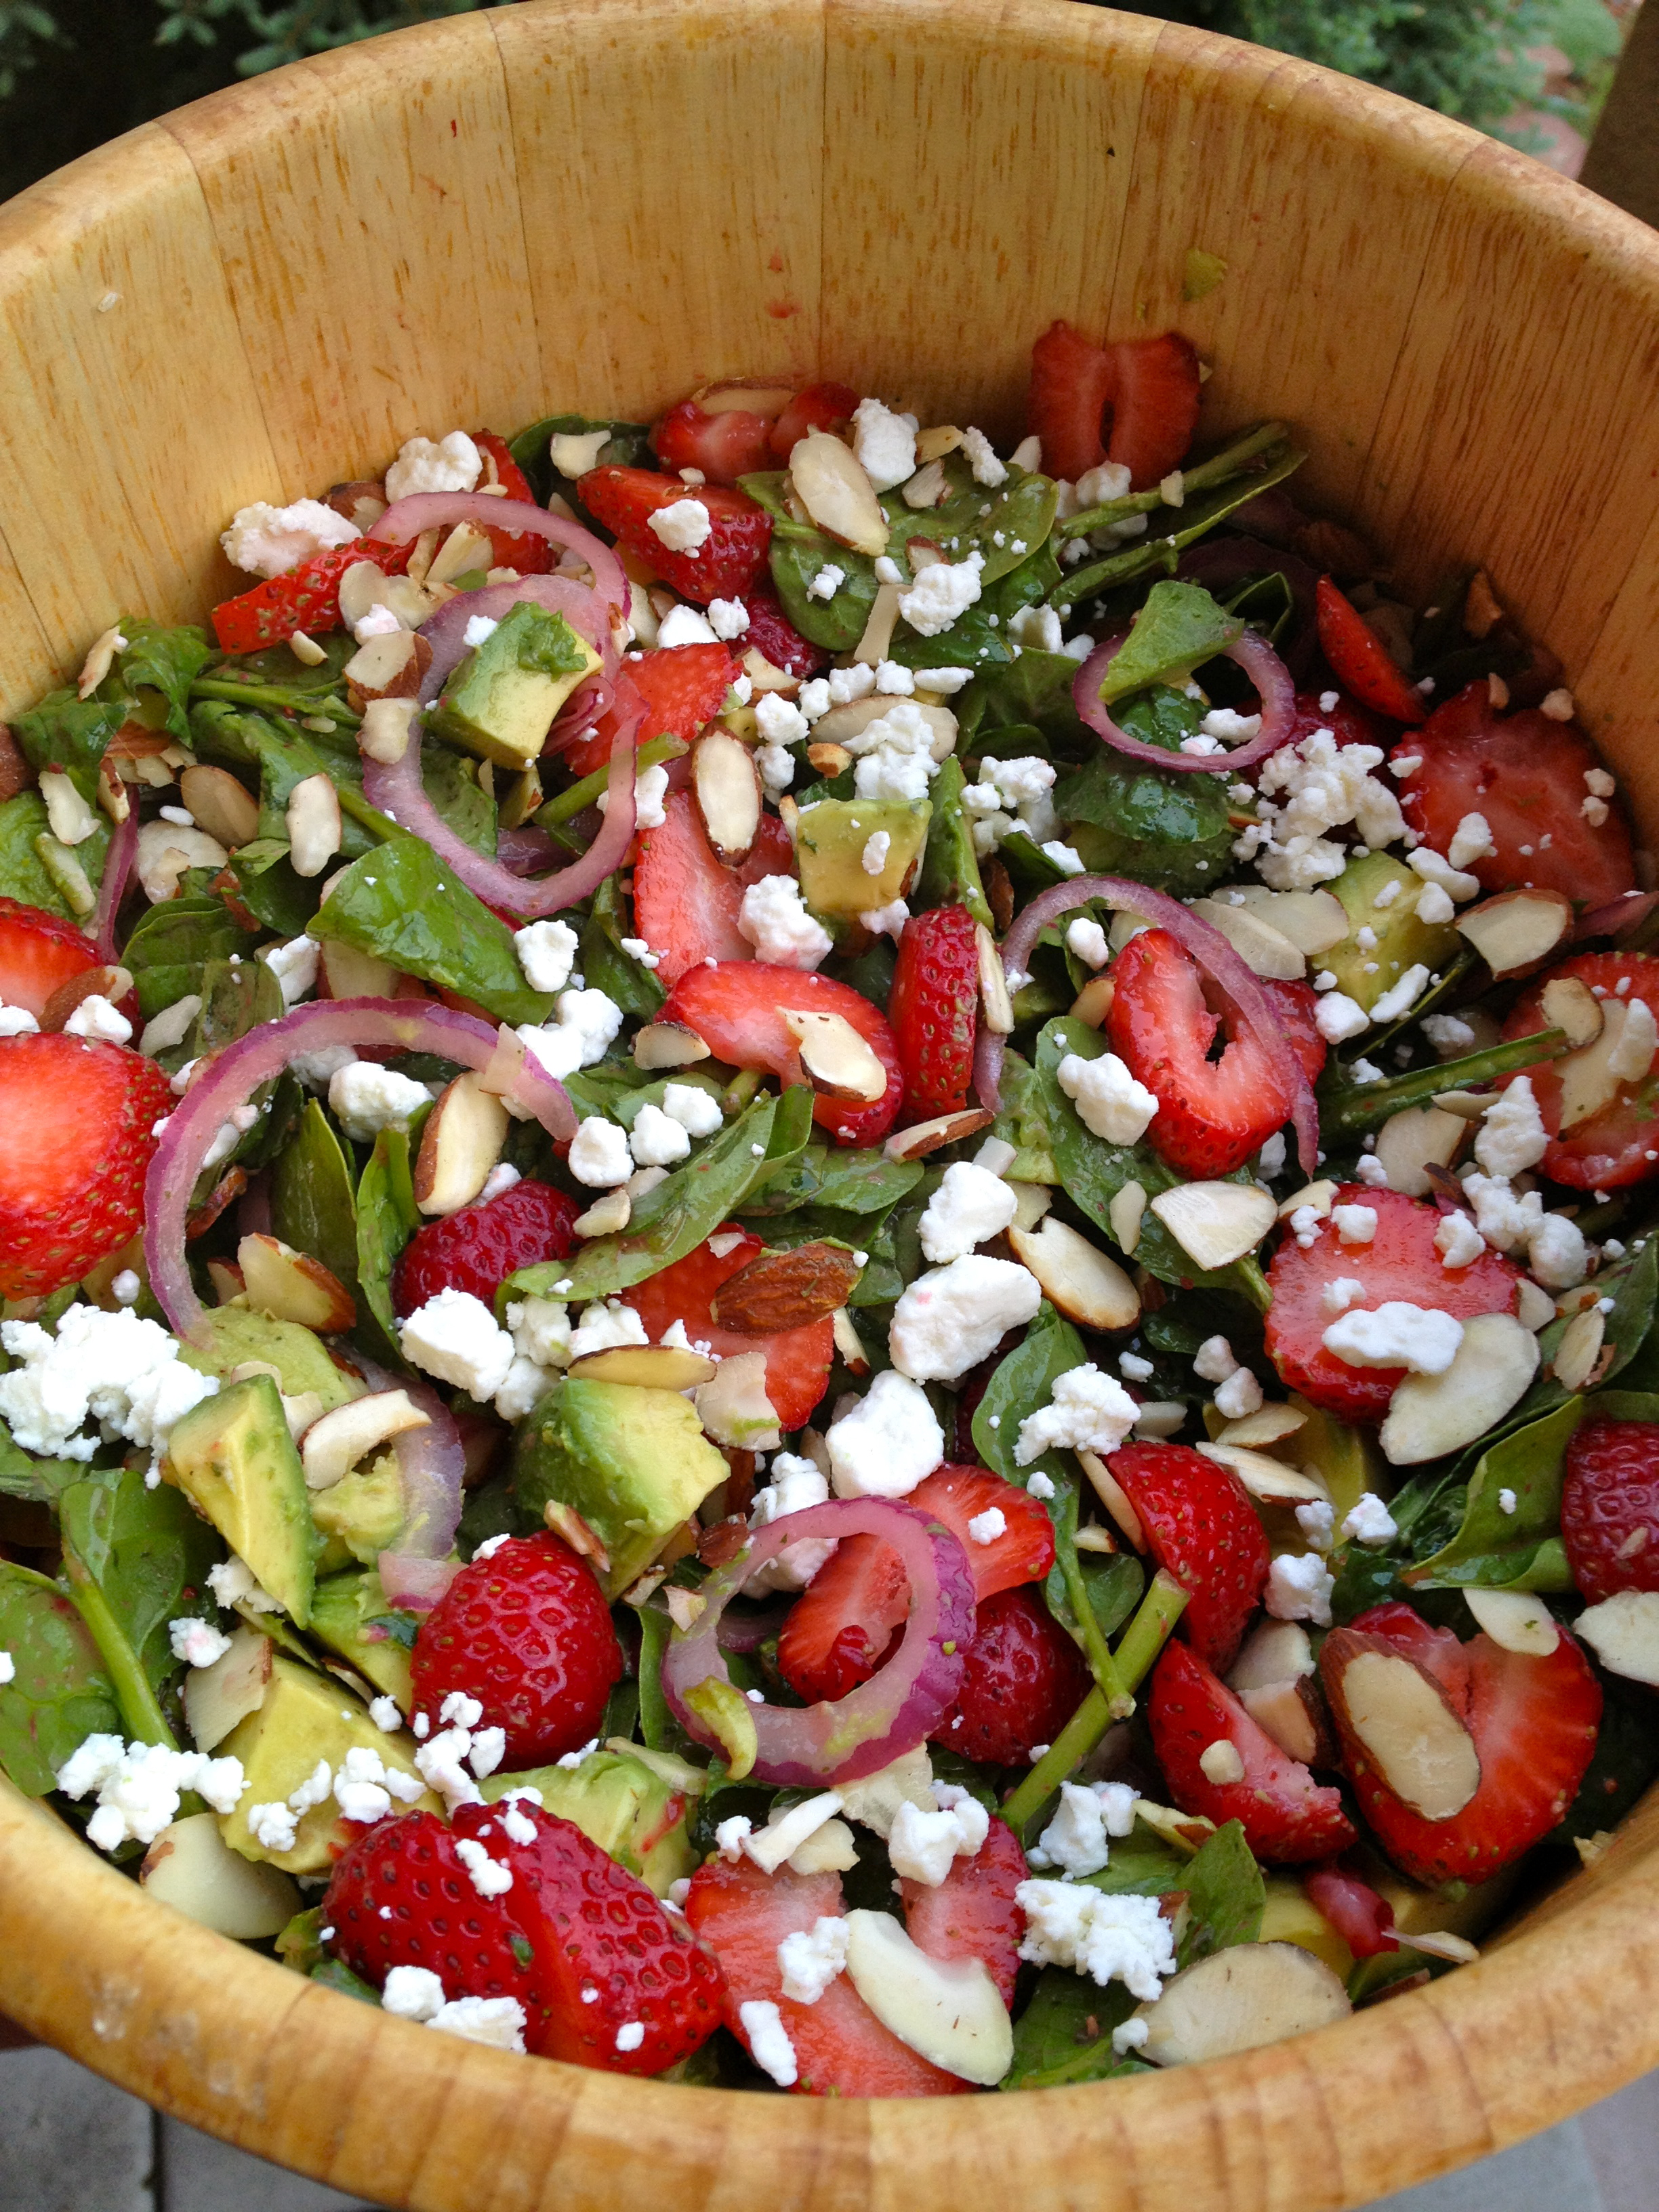 Spinach, Strawberry & Avocado Salad with Strawberry Vinaigrette